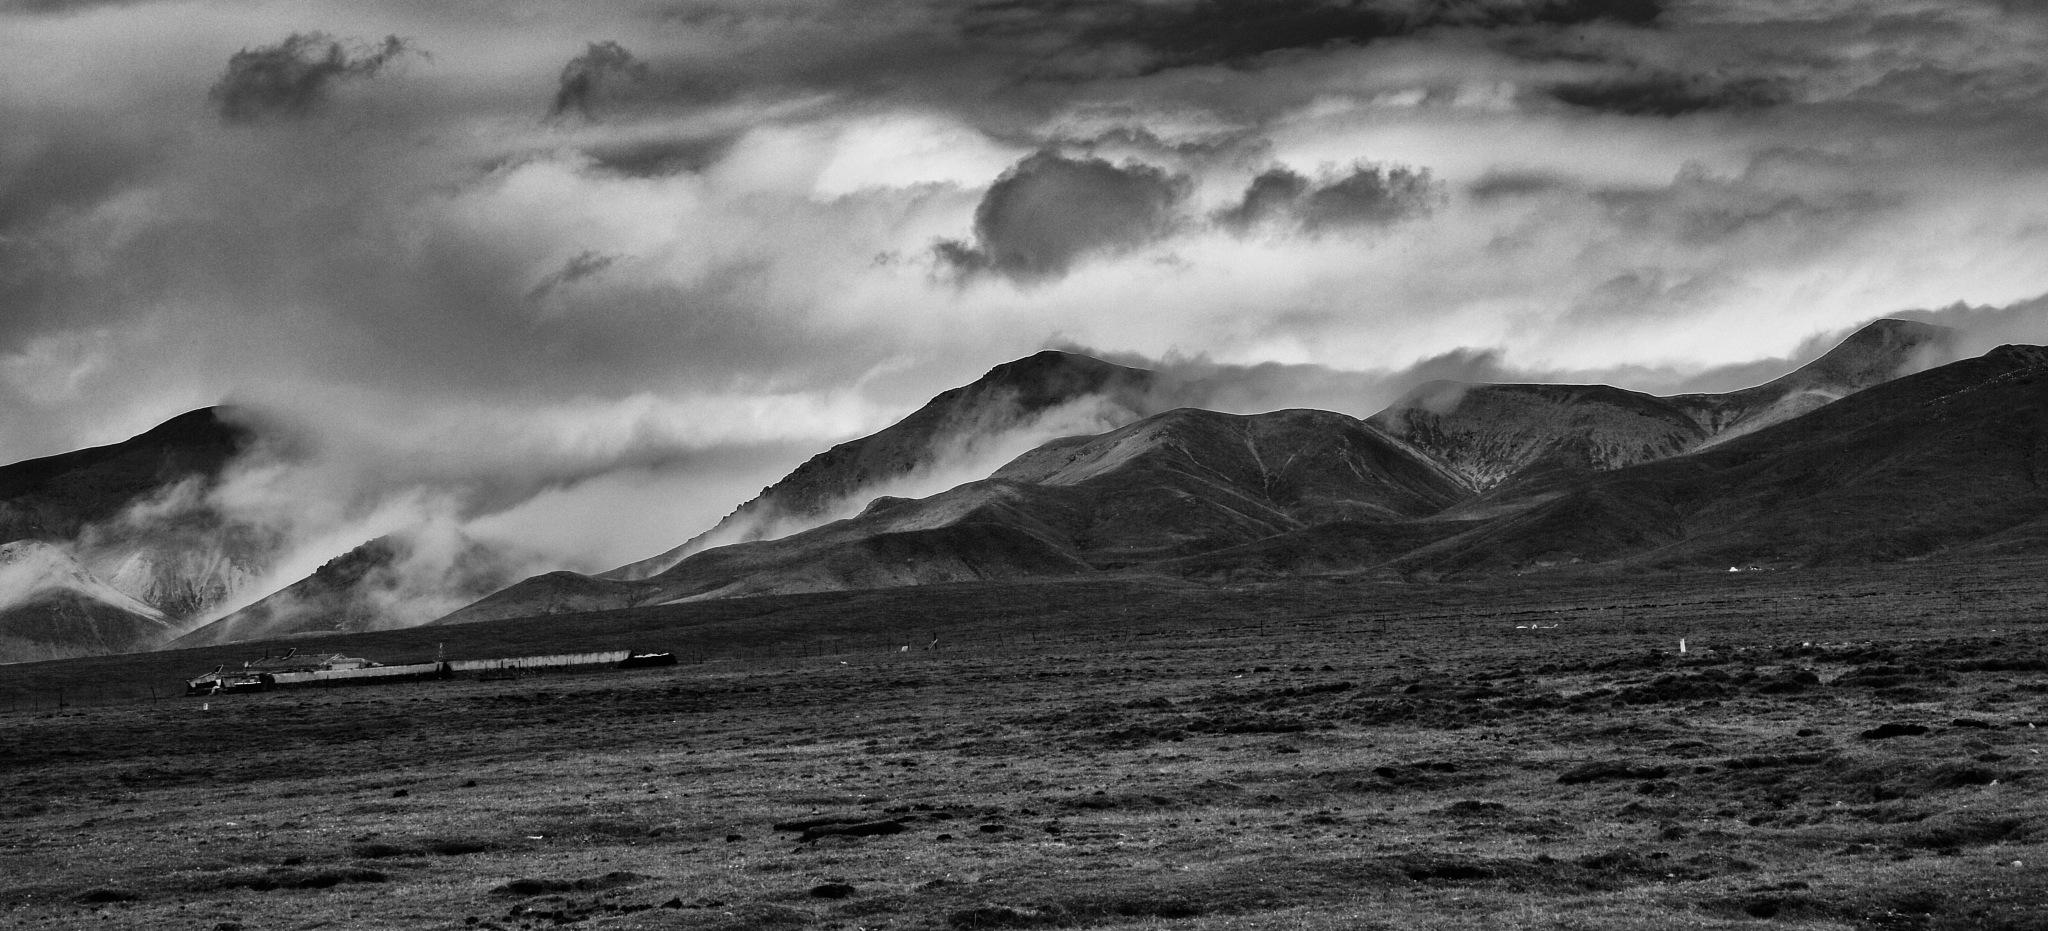 Cloudy  by leecj0129